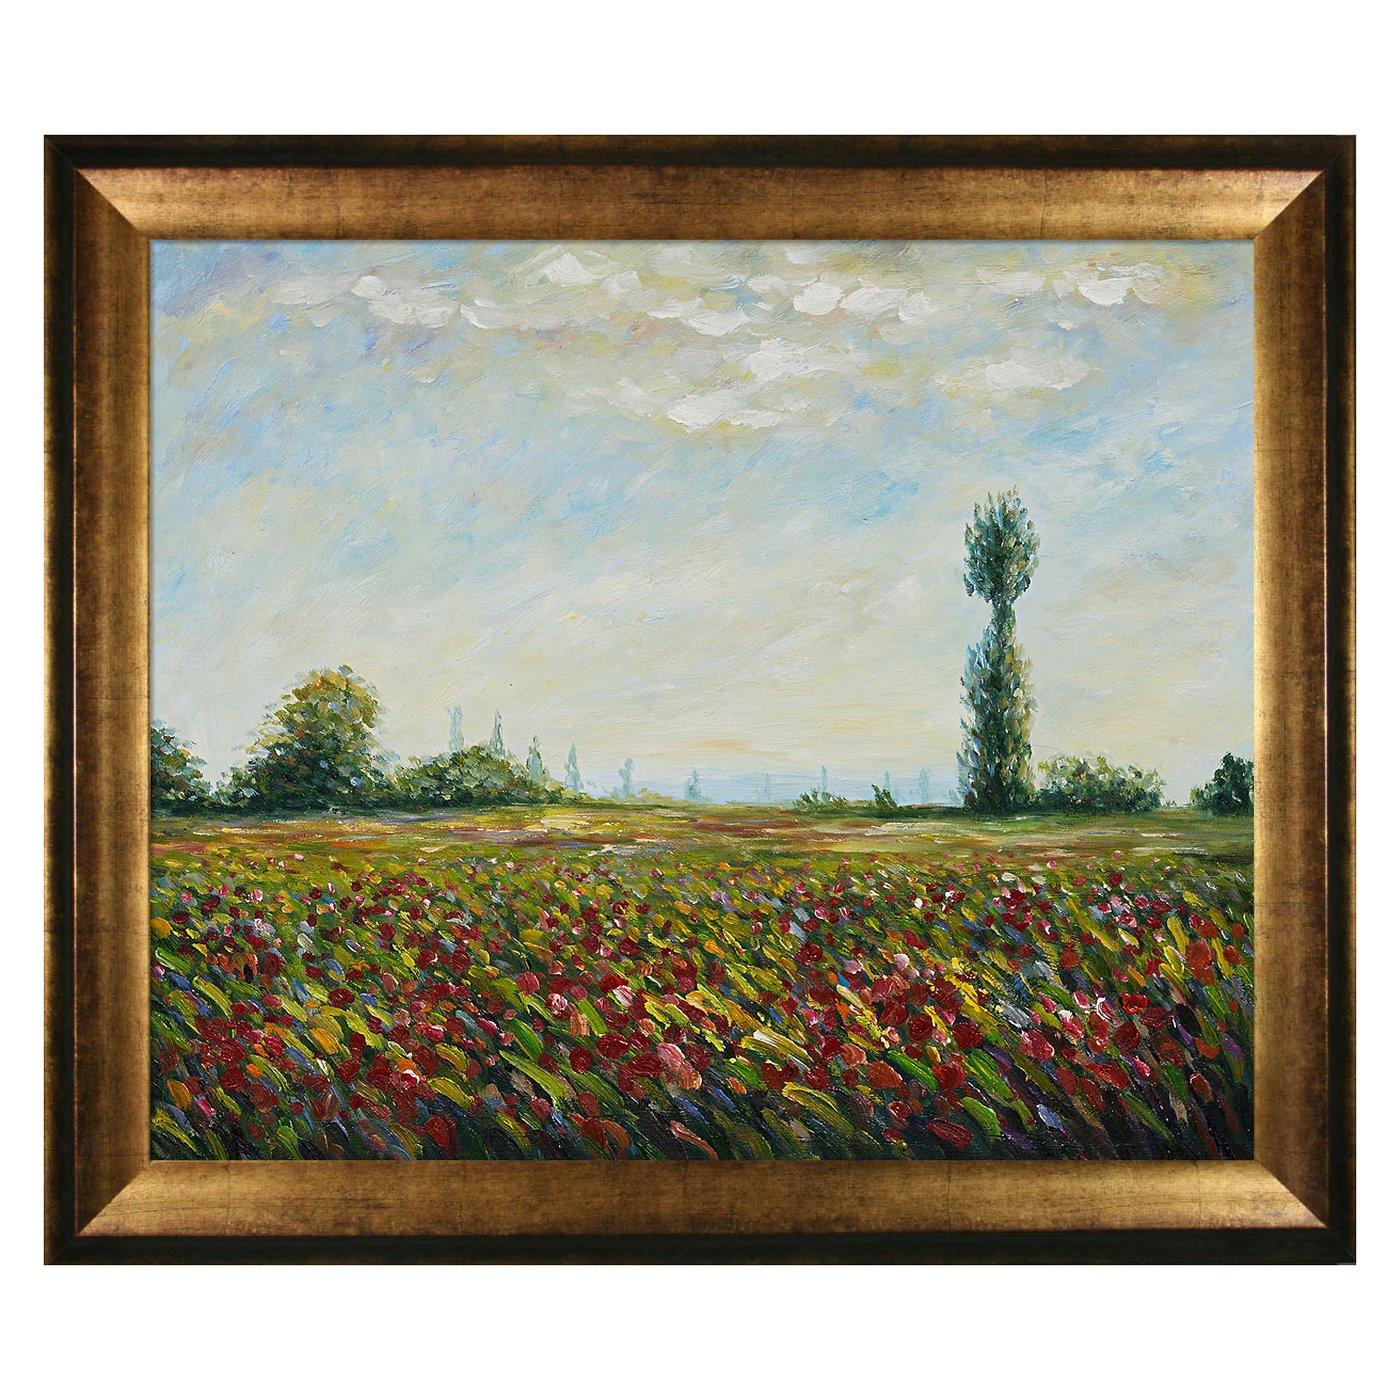 Best ideas about Overstock Wall Art . Save or Pin Overstock Art MON1329 FR X24 Claude Monet The Fields Now.